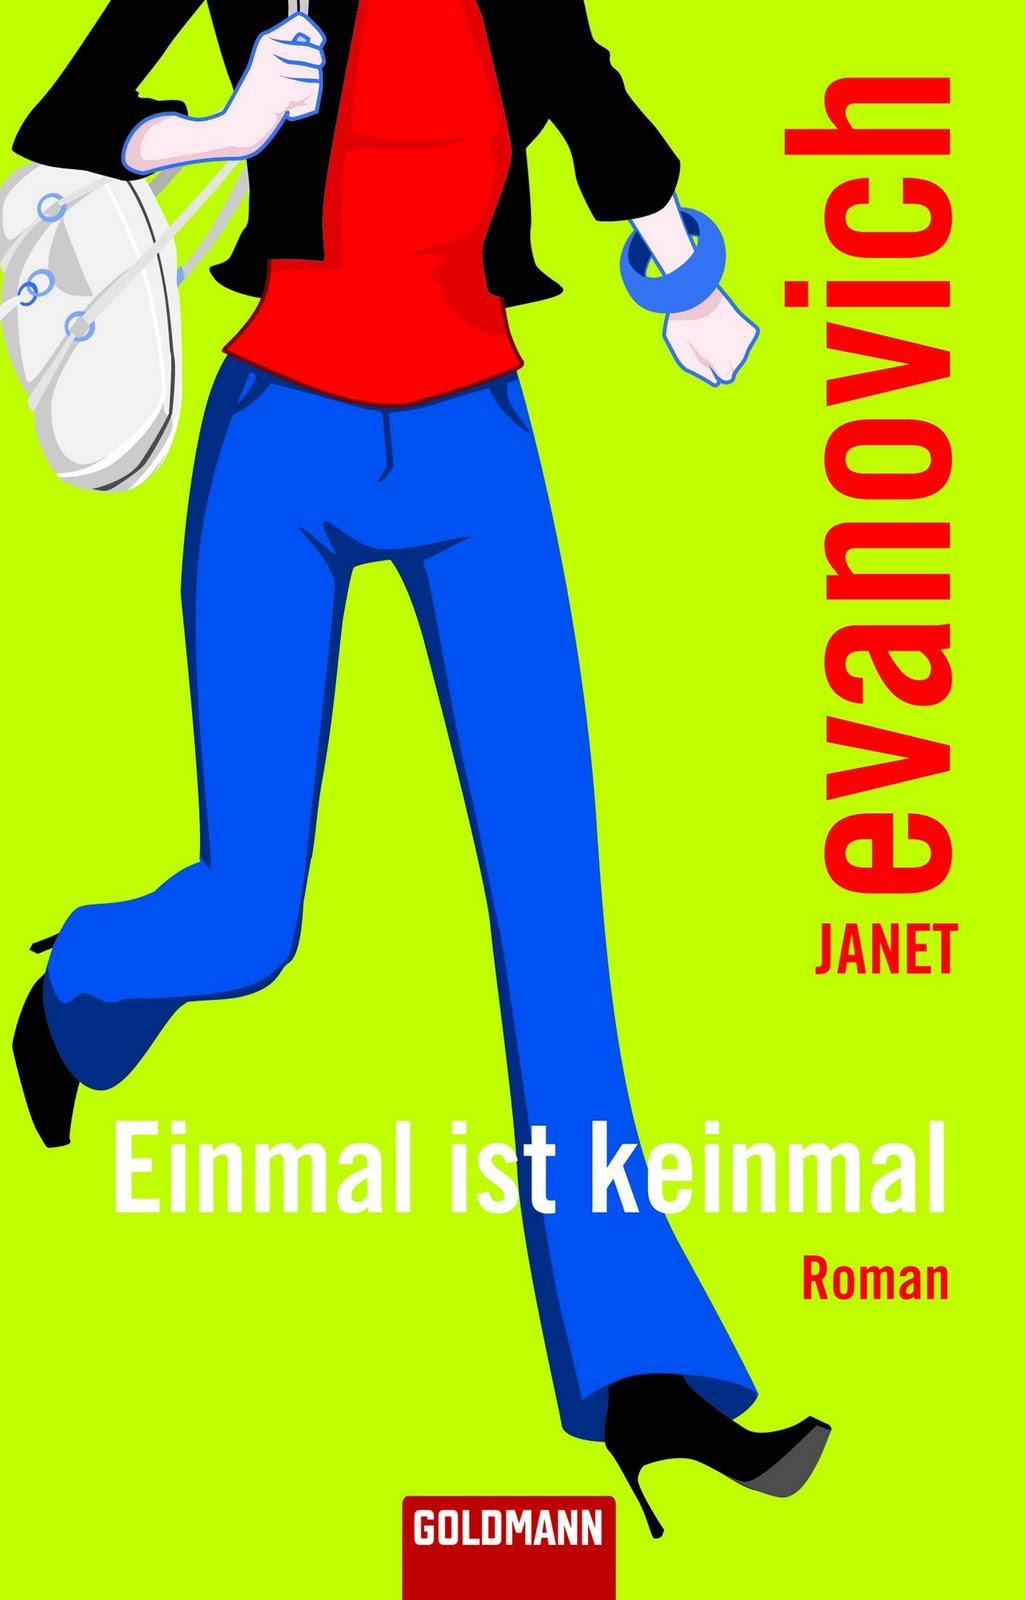 http://4.bp.blogspot.com/_JMjaAd3-lJM/S-AlgZA0U7I/AAAAAAAAAas/bCiEz8_UKlw/s1600/Evanovich,+Janet+-+Einmal+ist+keinmal.jpg